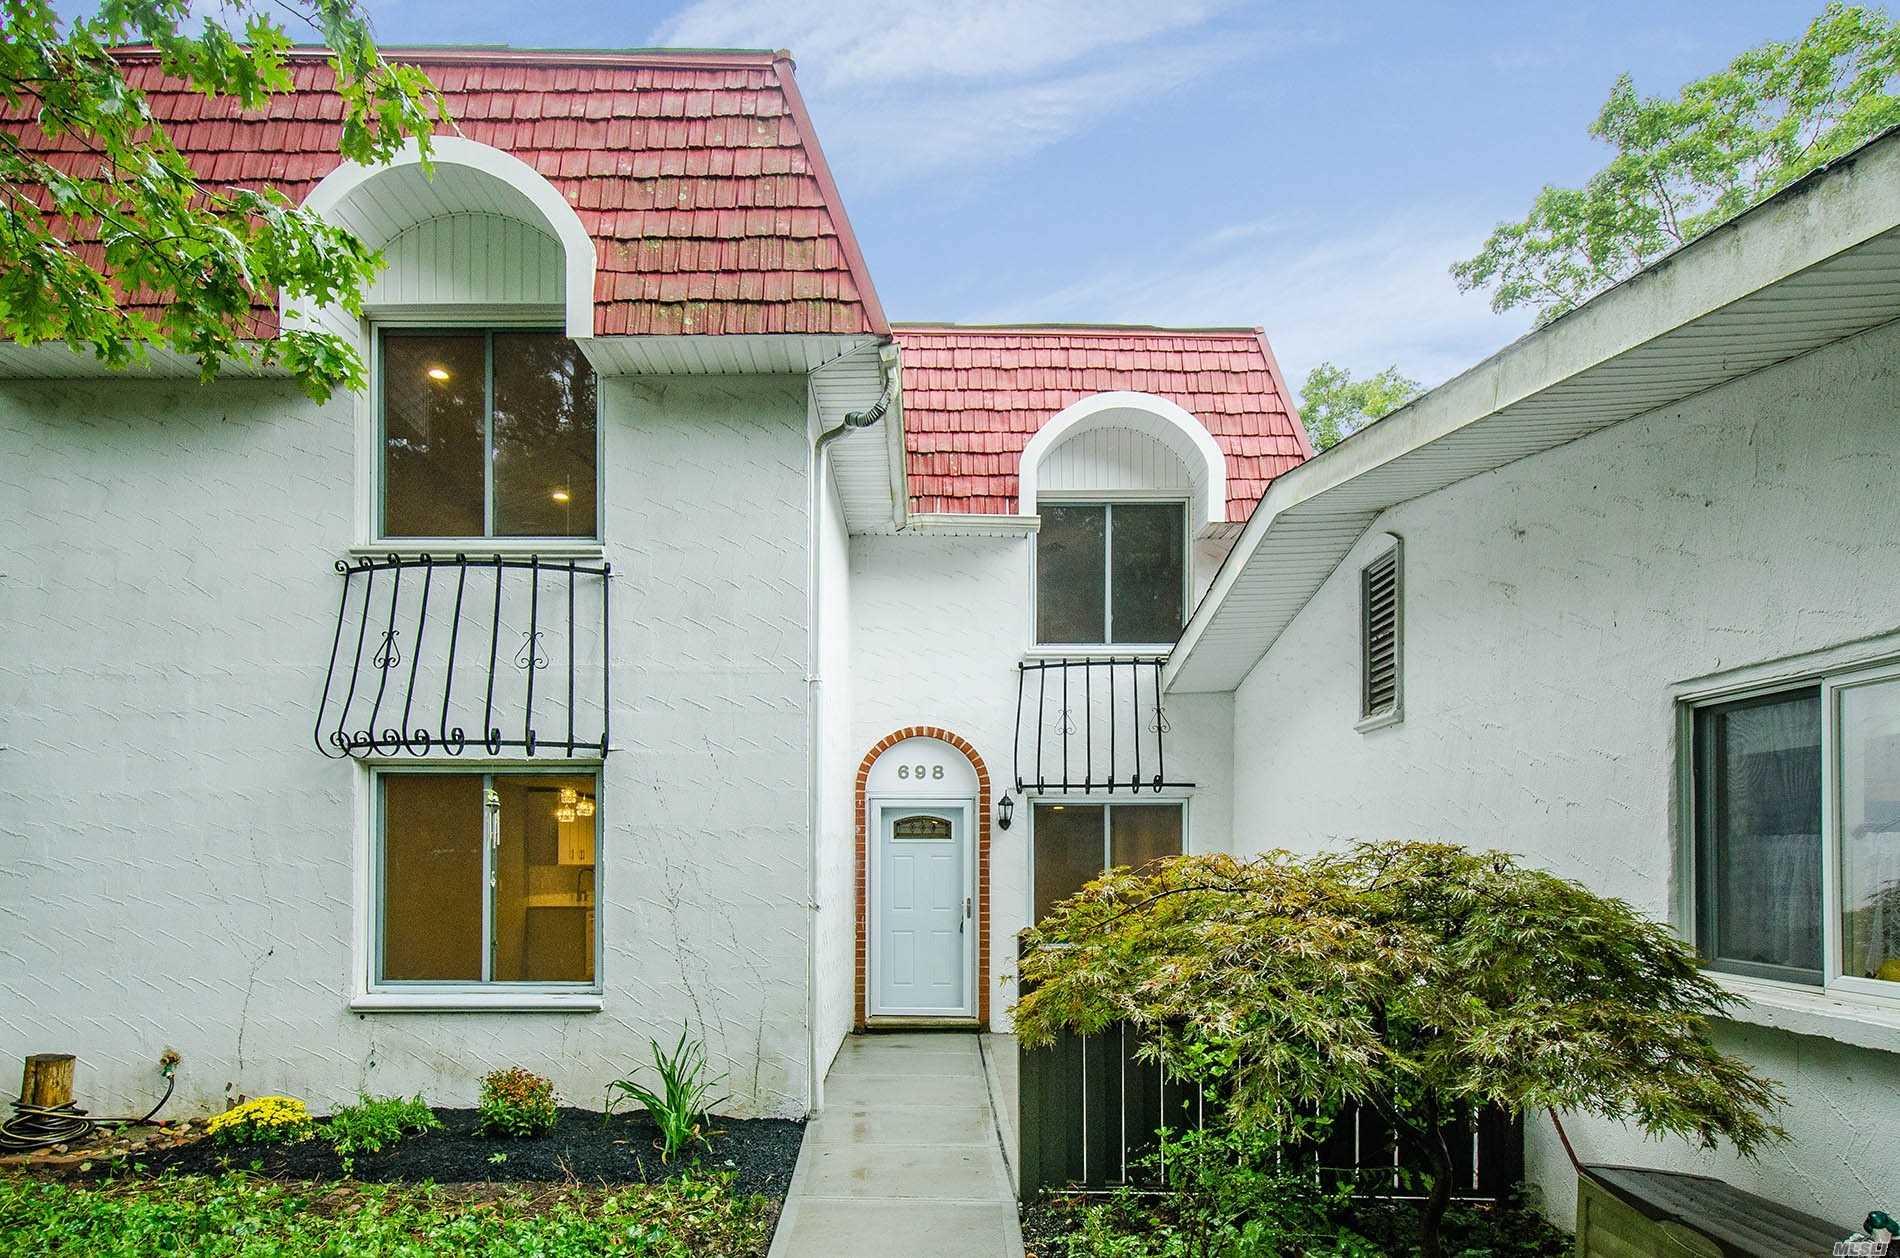 Property for sale at 698 Blue Ridge Dr, Medford,  NY 11763